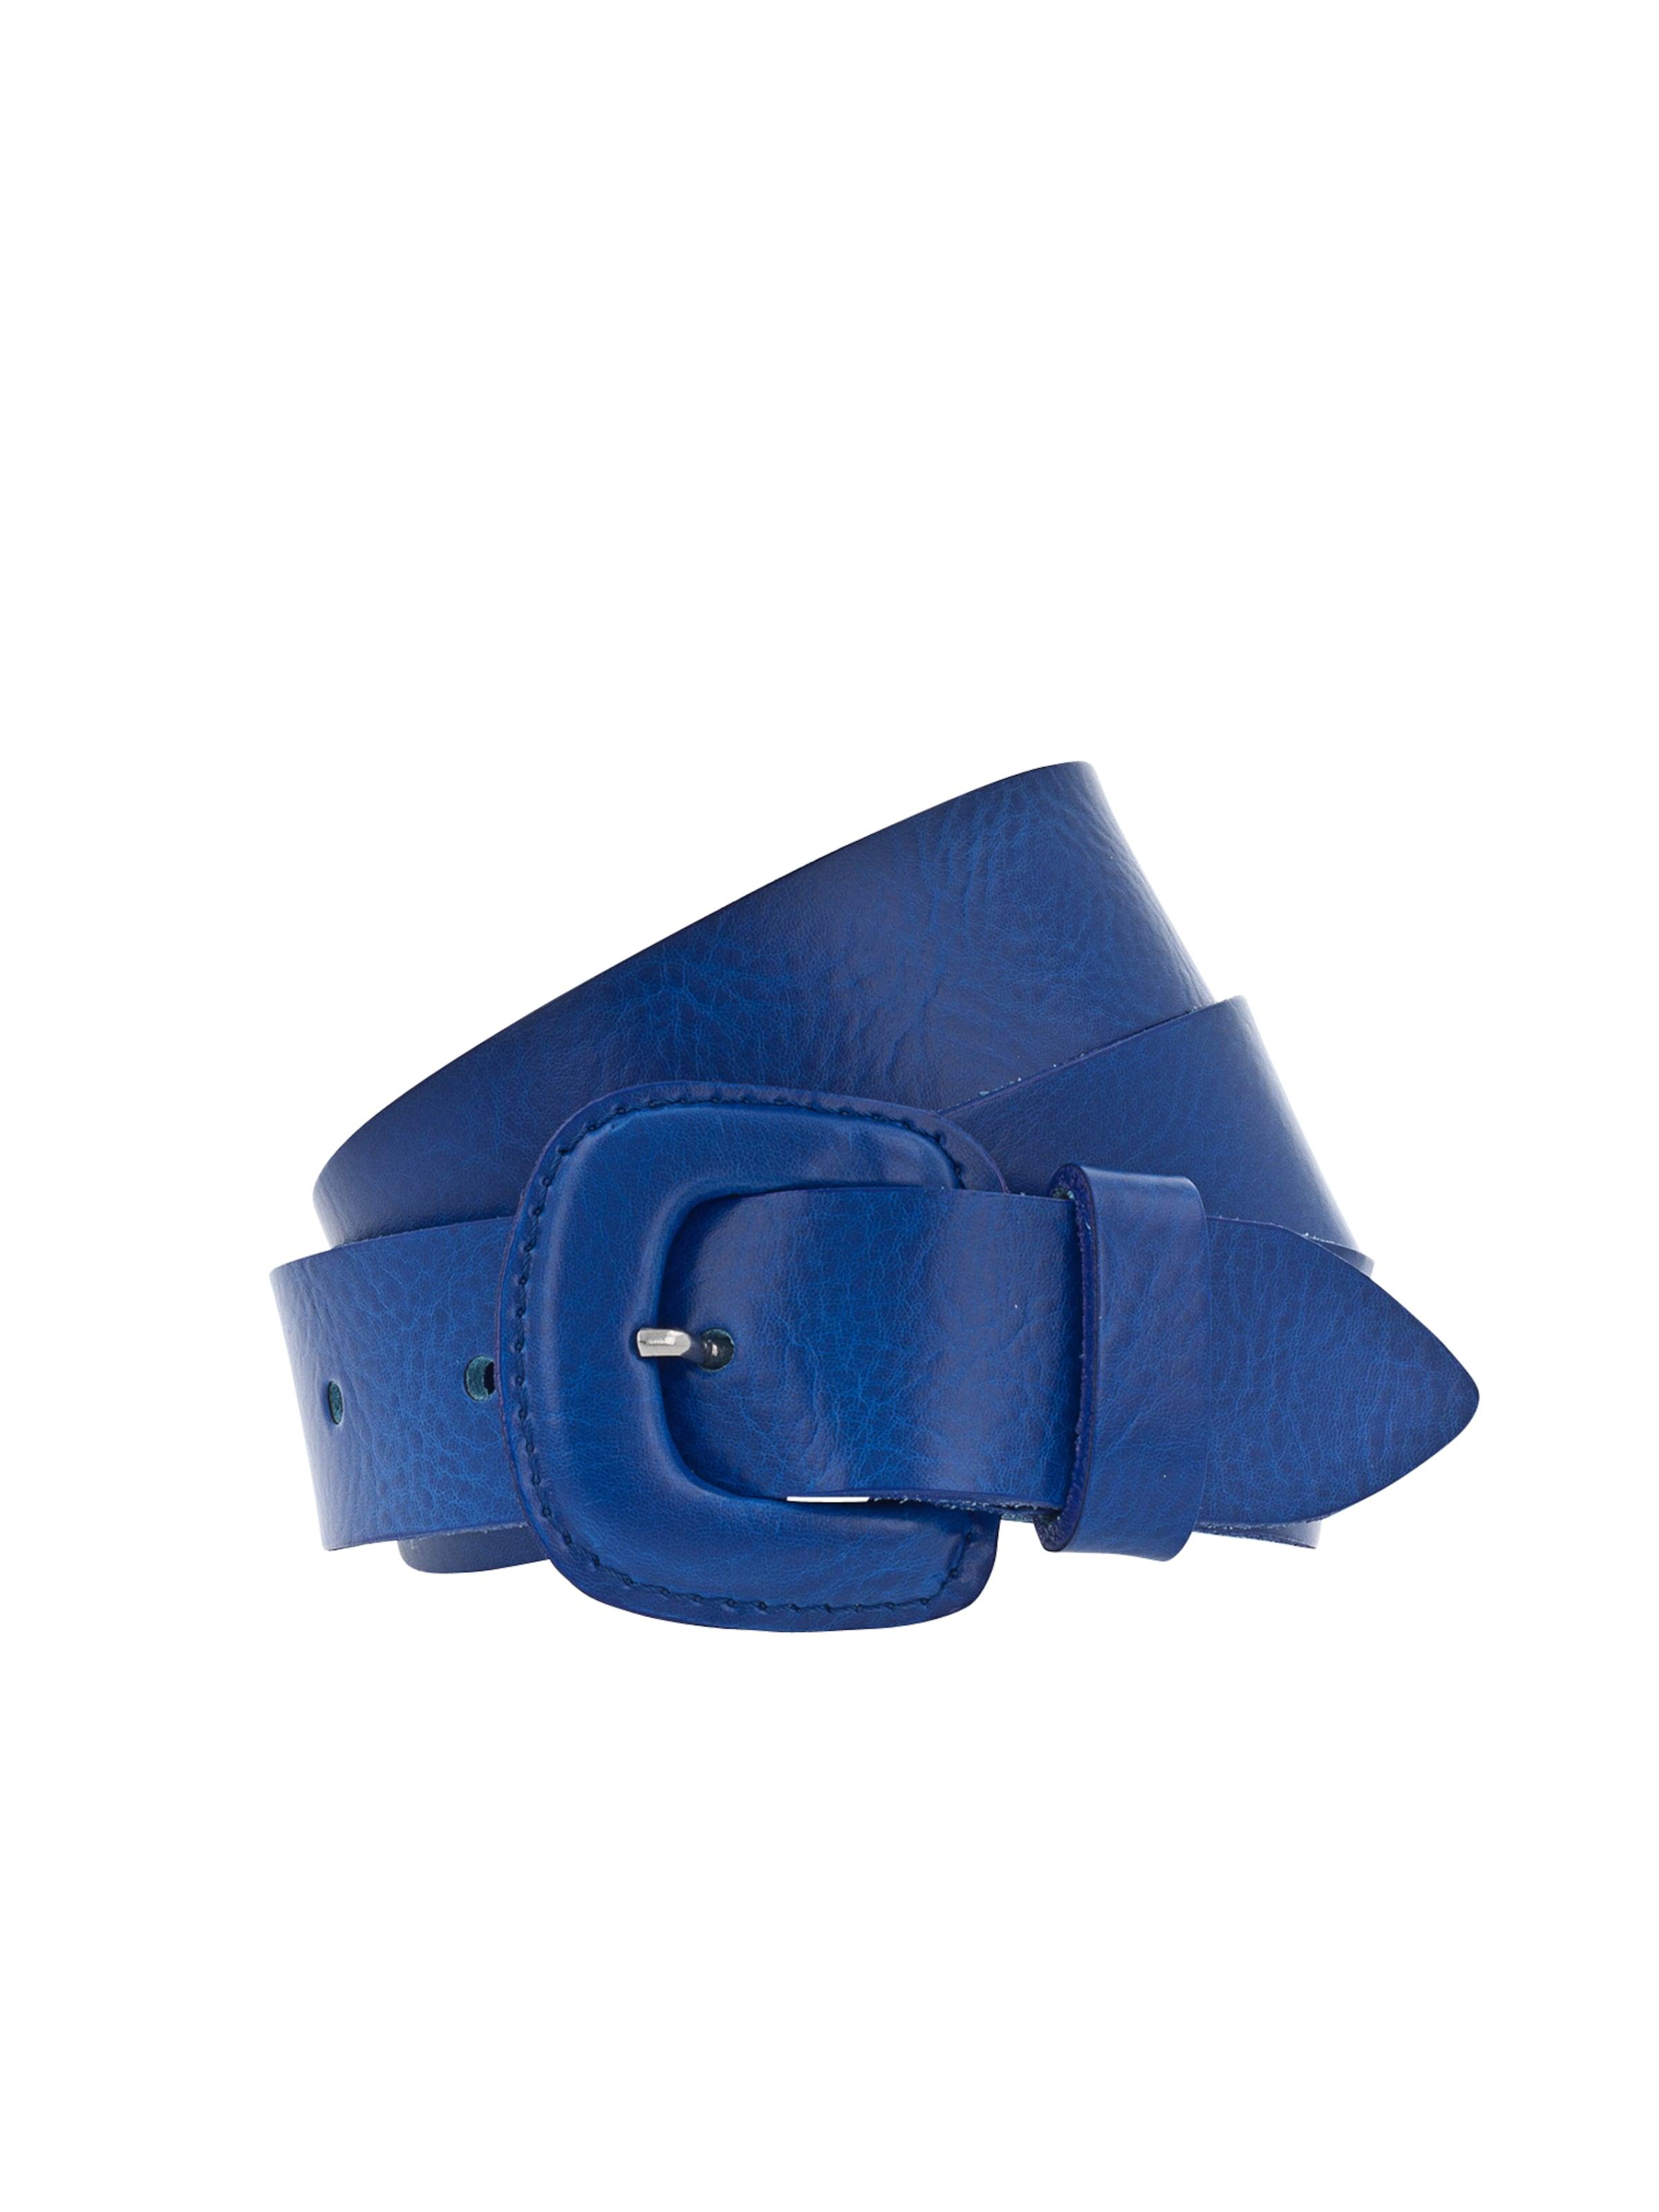 Bleu Bleu Ceinture Ceinture Bleu Vanzetti Vanzetti Ceinture En En En Vanzetti CxBoWerd